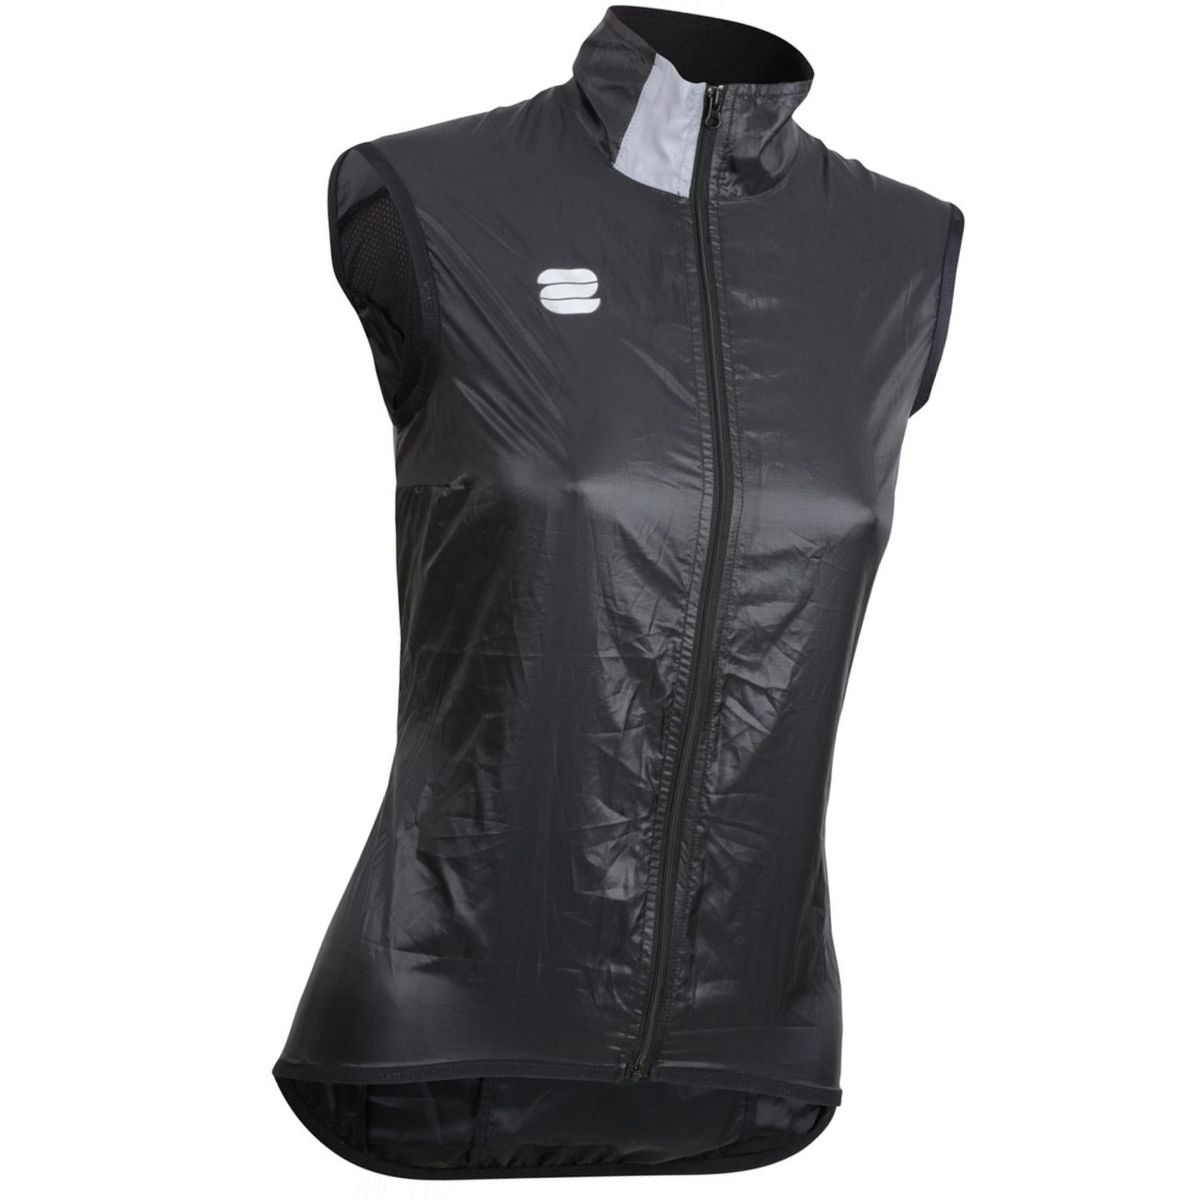 Sportful Hot Pack Easylight Vest - Women's